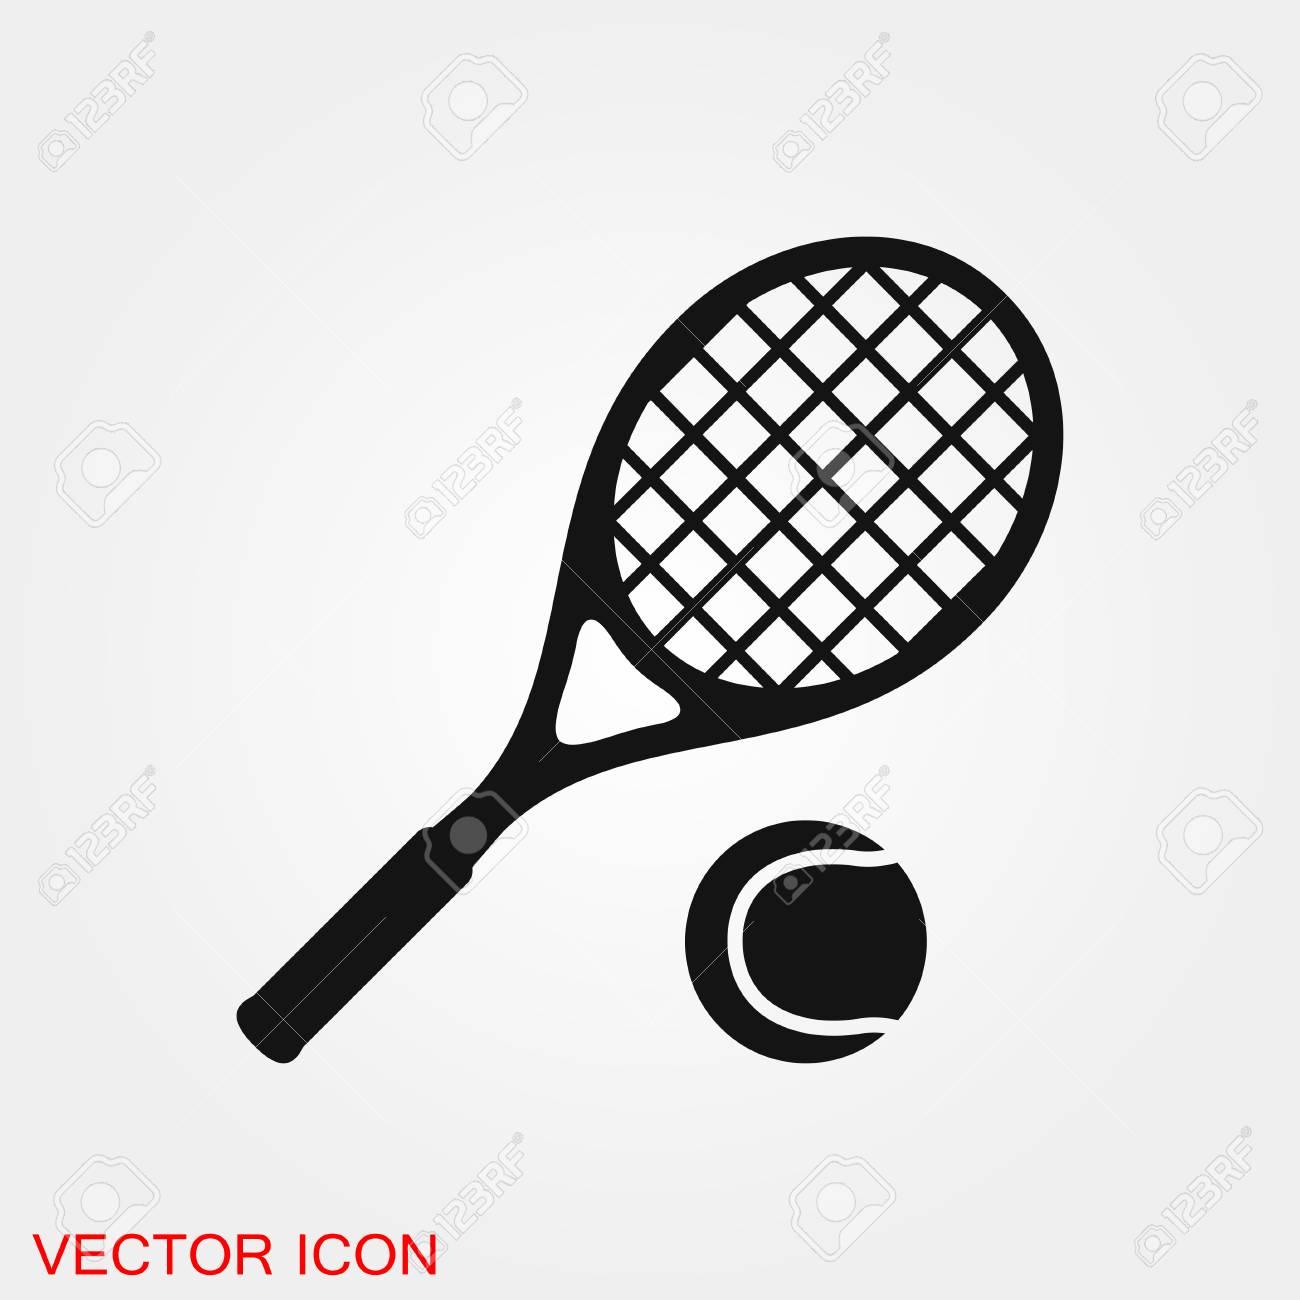 Tennis icon vector sign symbol for design - 122258978